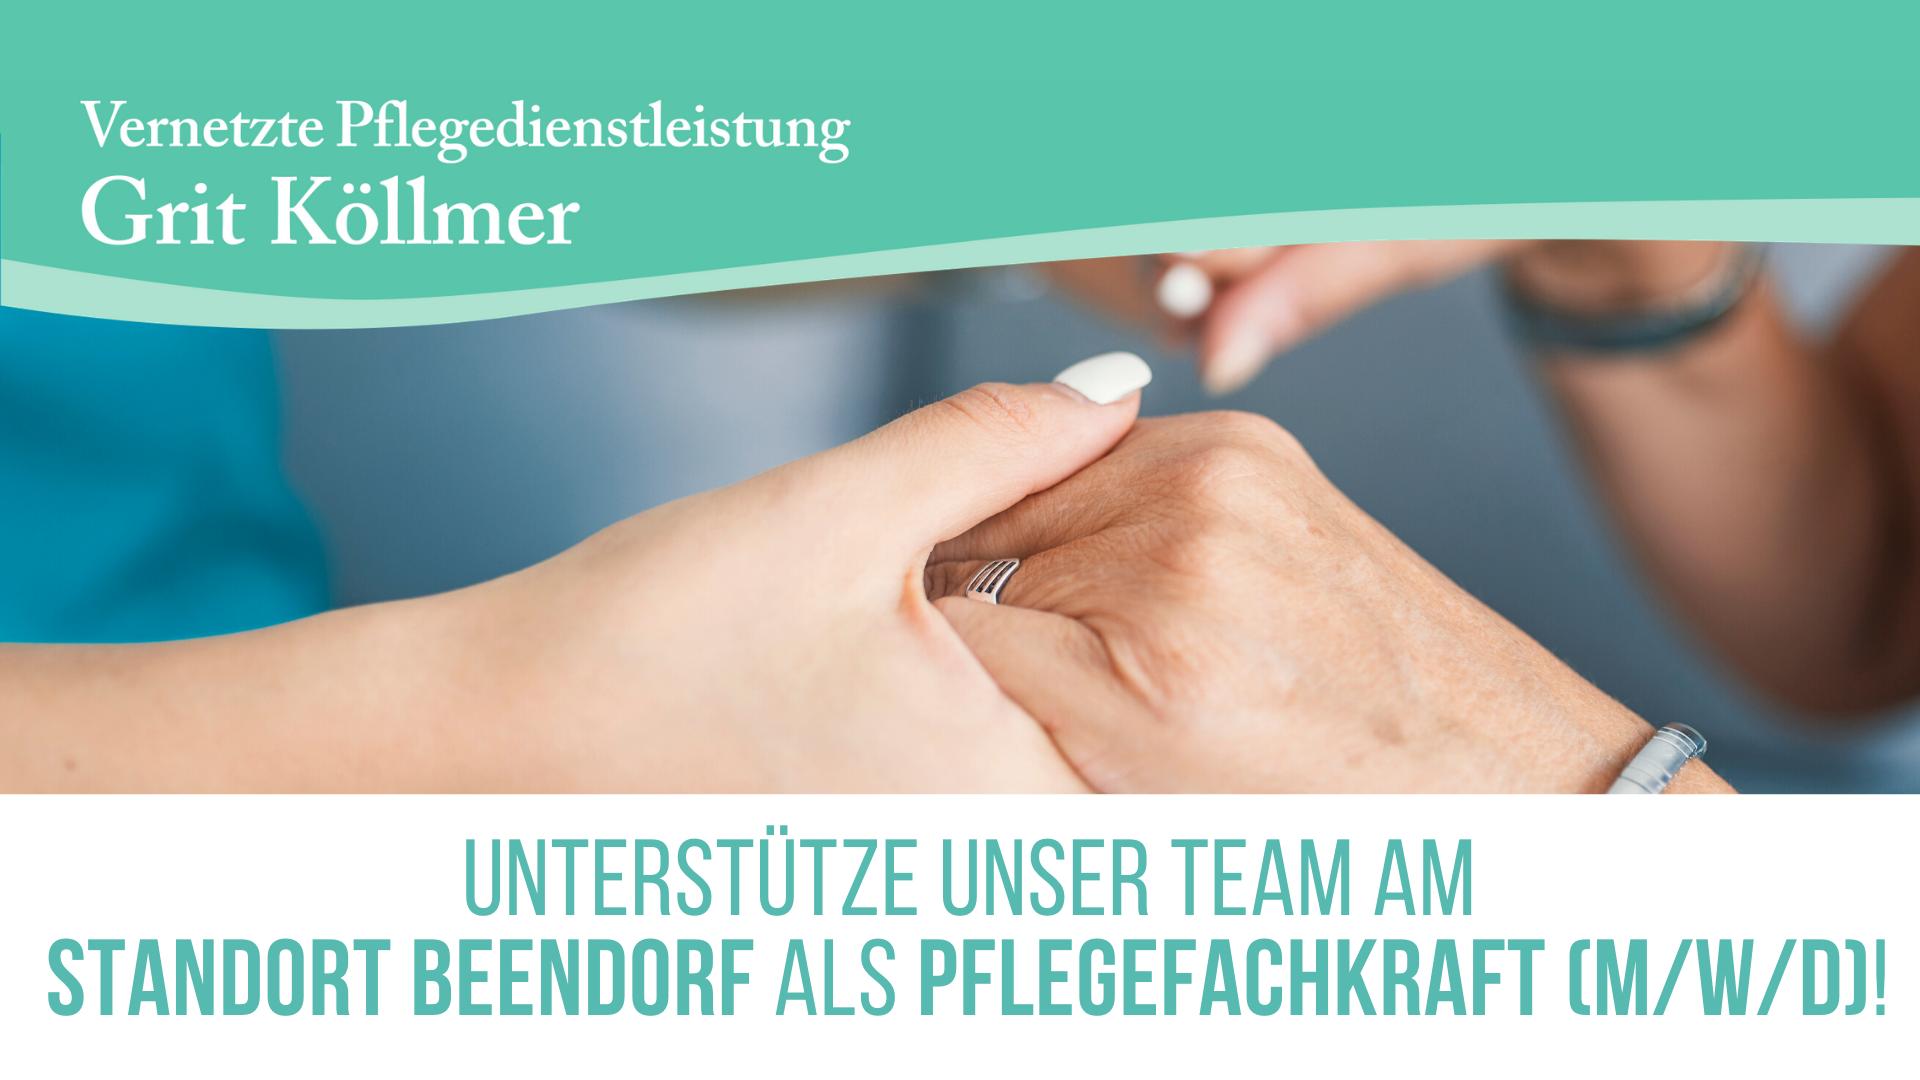 koellmer-pflegekraftjob-in-beendorf